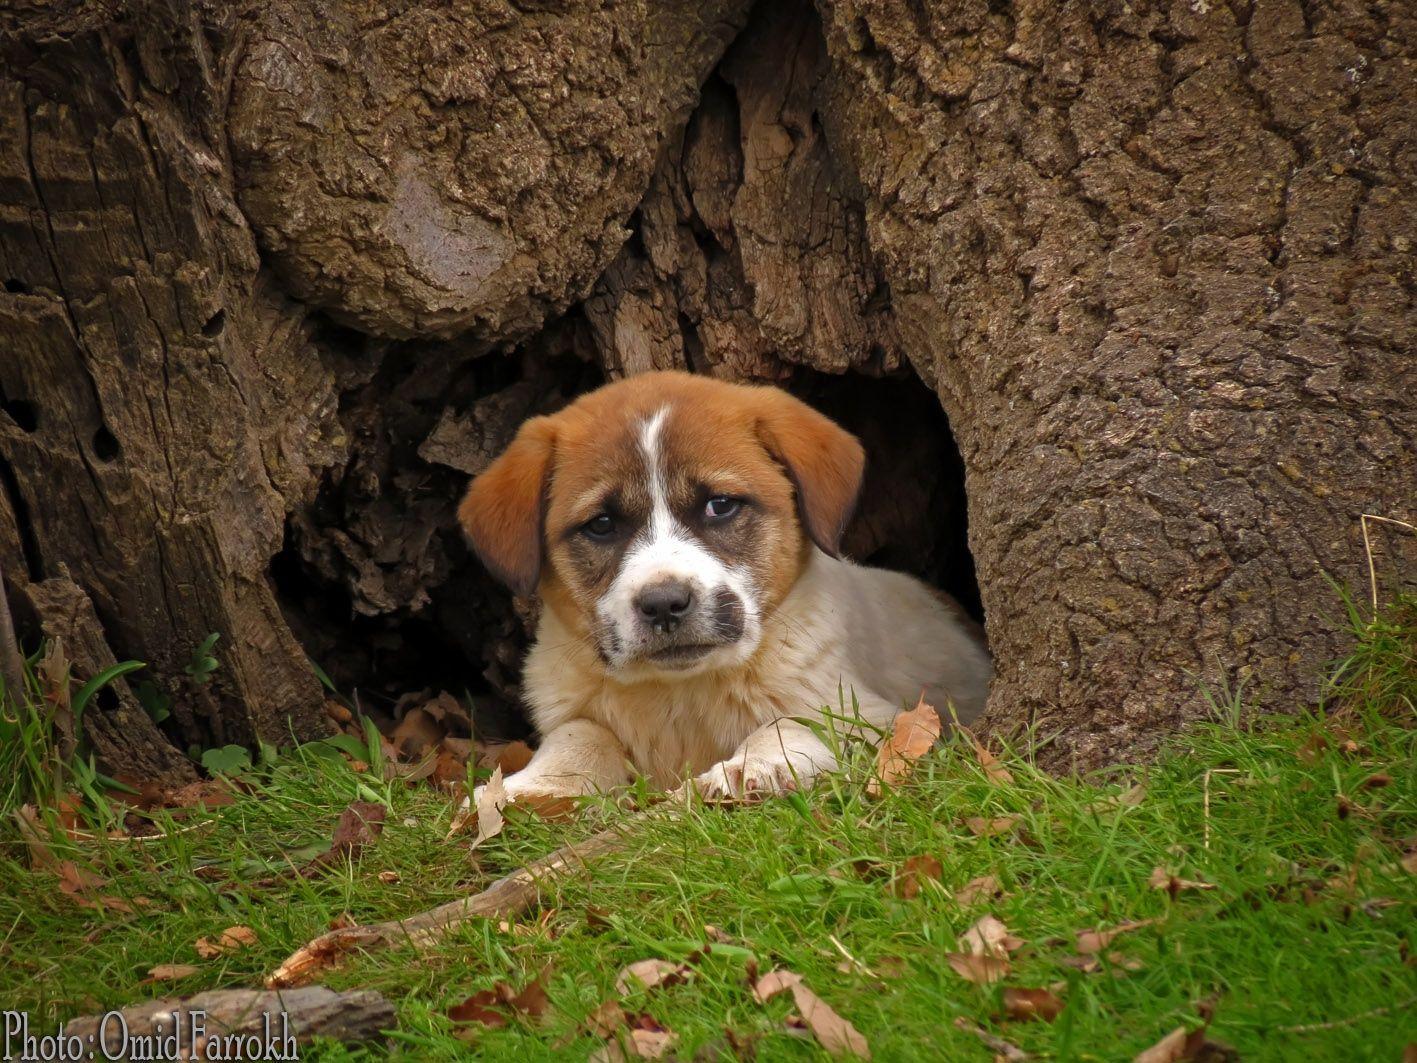 Sad Puppy by Omid Farrokh on 500px